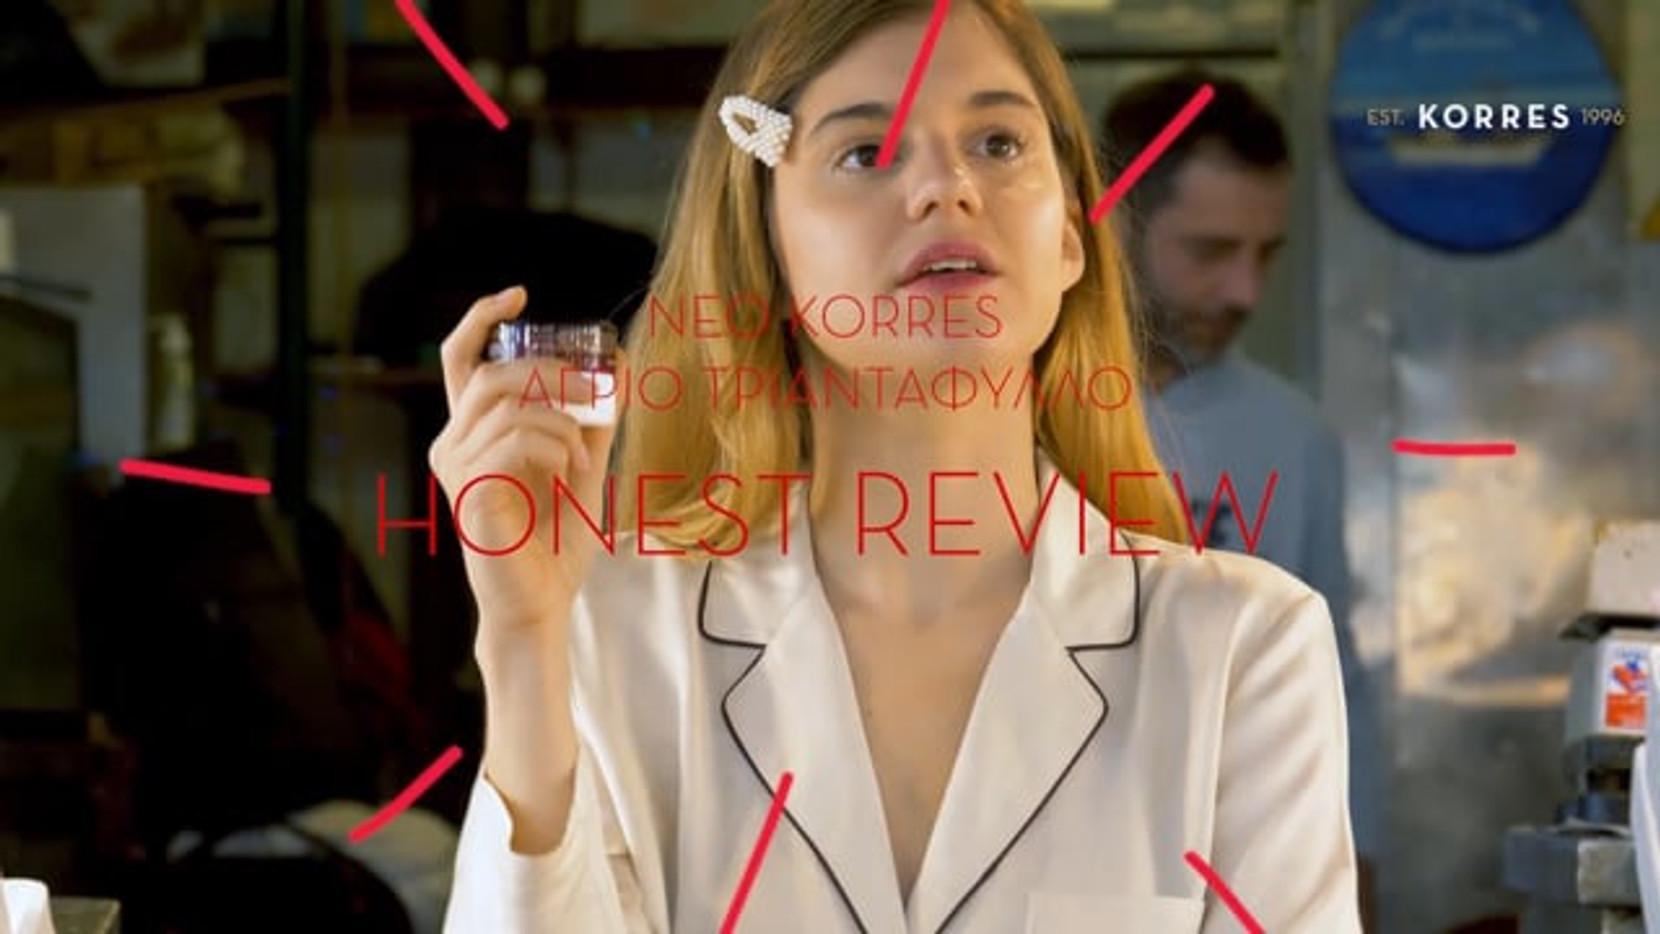 Korres Wild Rose Honest Review